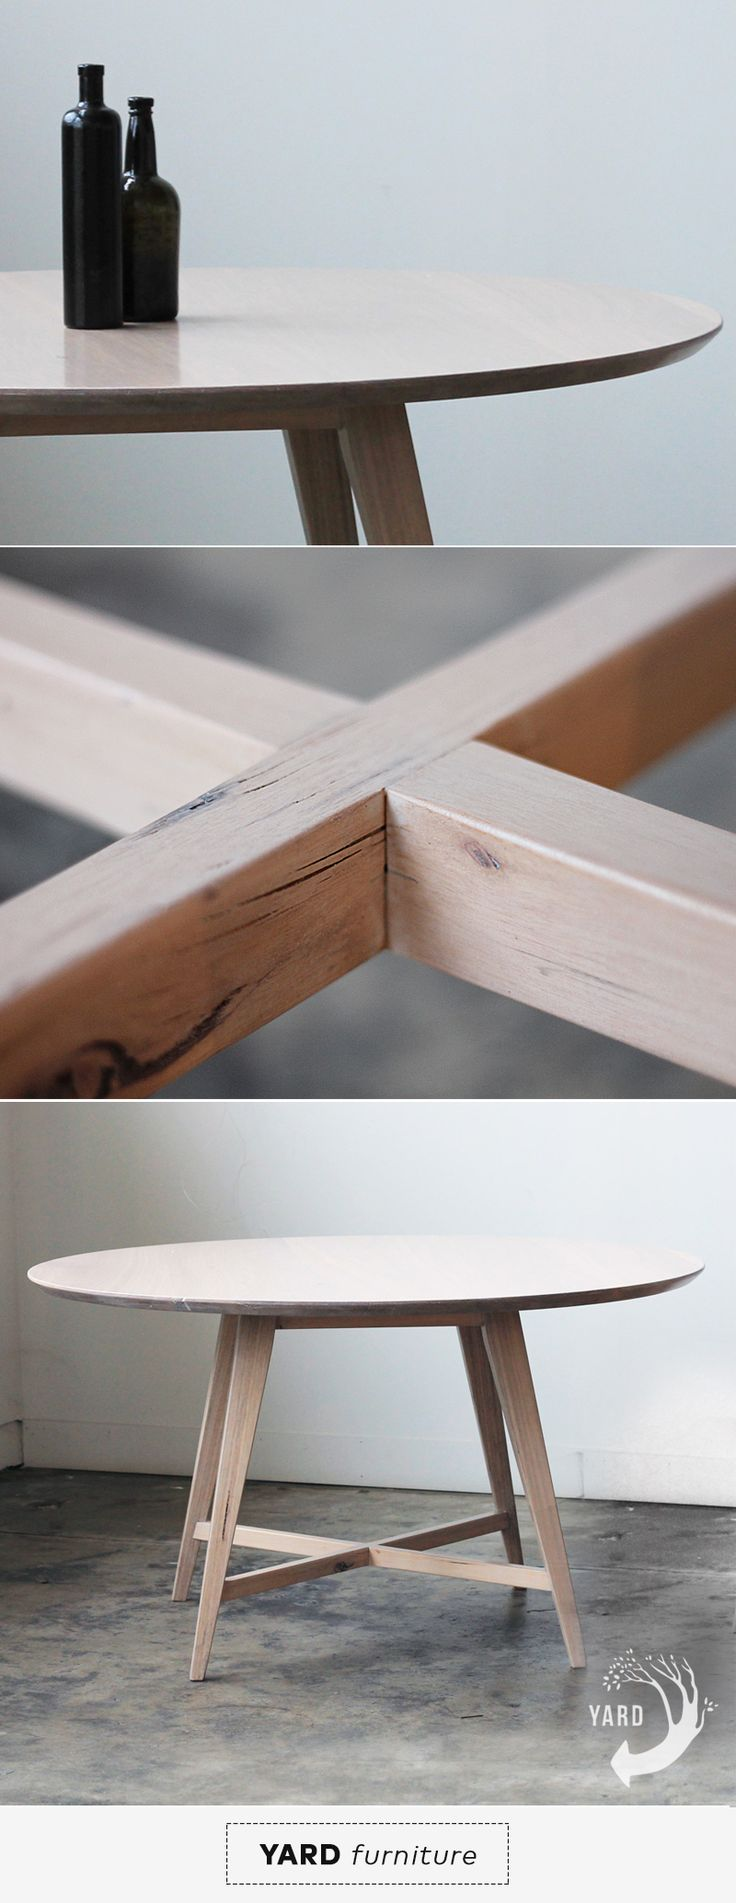 YARD Furniture - Custom made round dining table. Recycled, salvaged mountain ash blonde timber. Minimal furniture maker, Melbourne Australia.